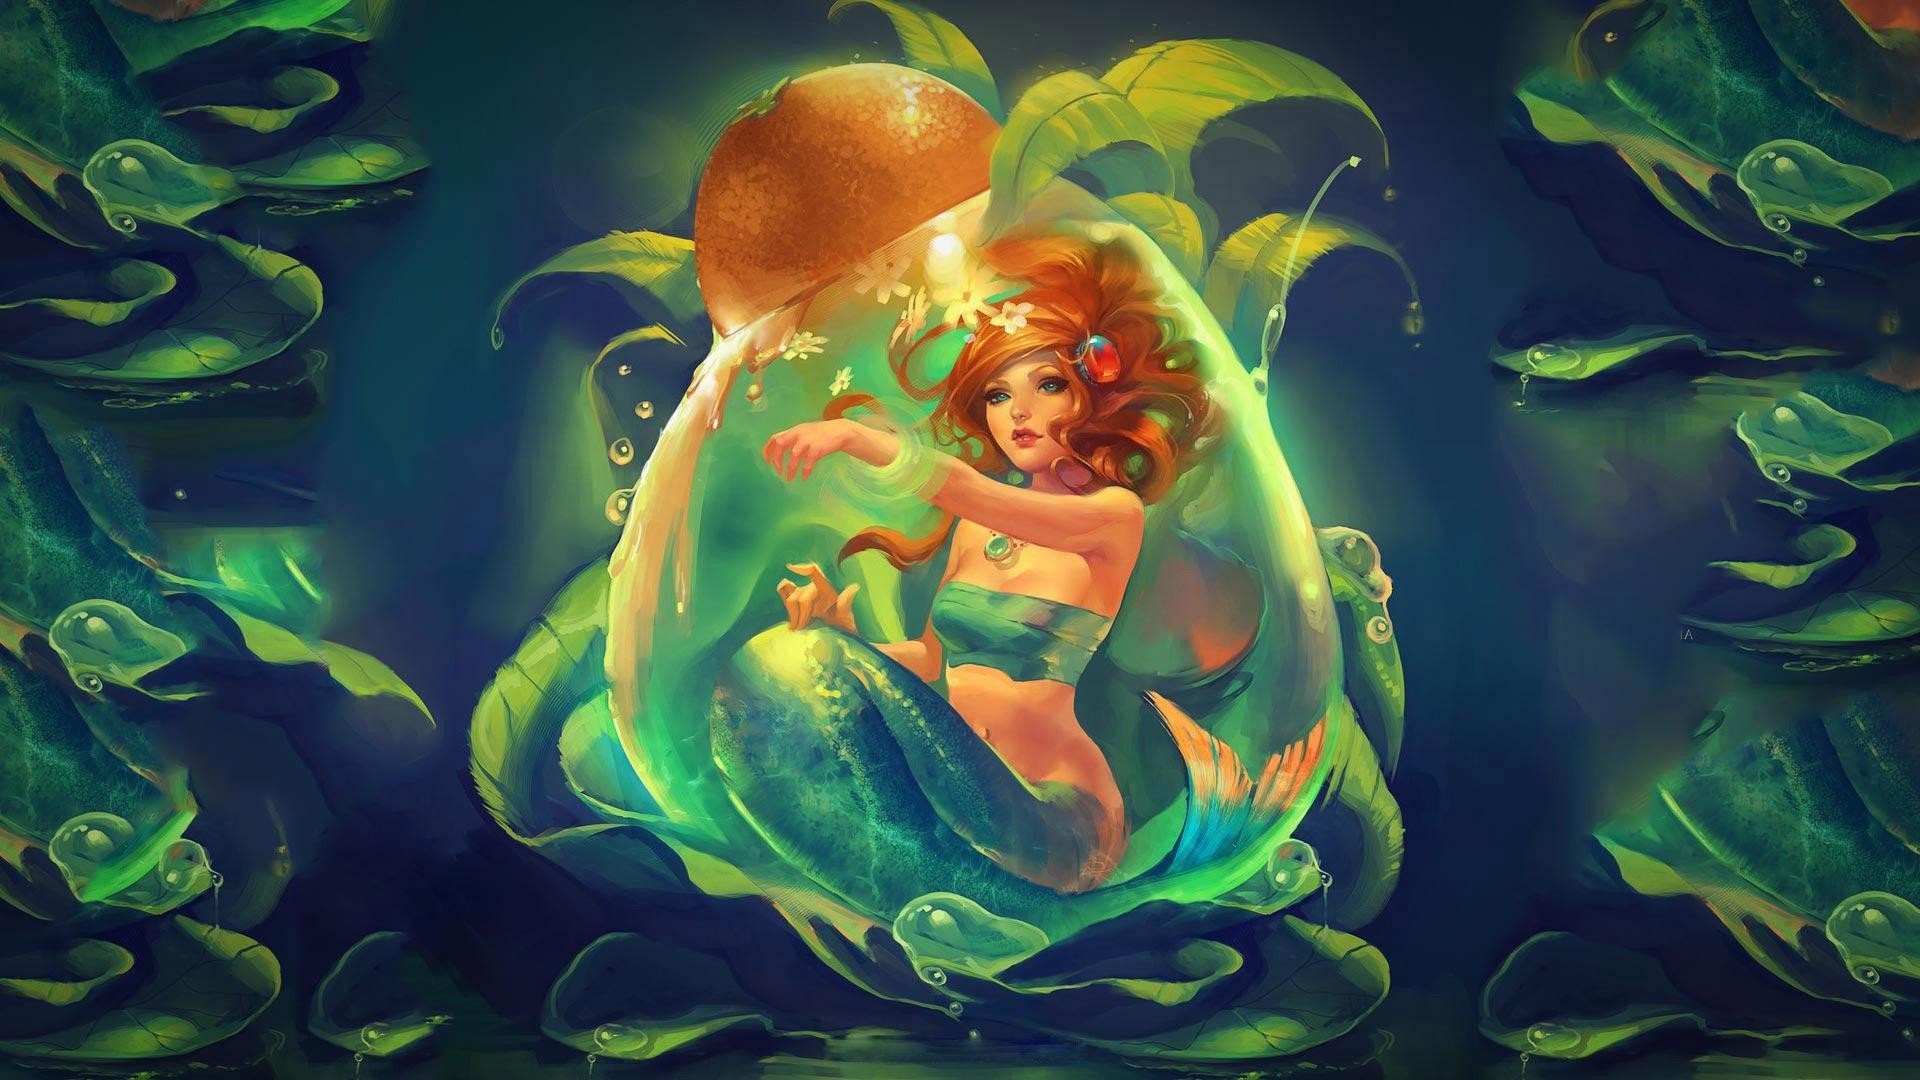 Lonely Girl Wallpaper Download Free Free Desktop Mermaid Wallpapers Pixelstalk Net